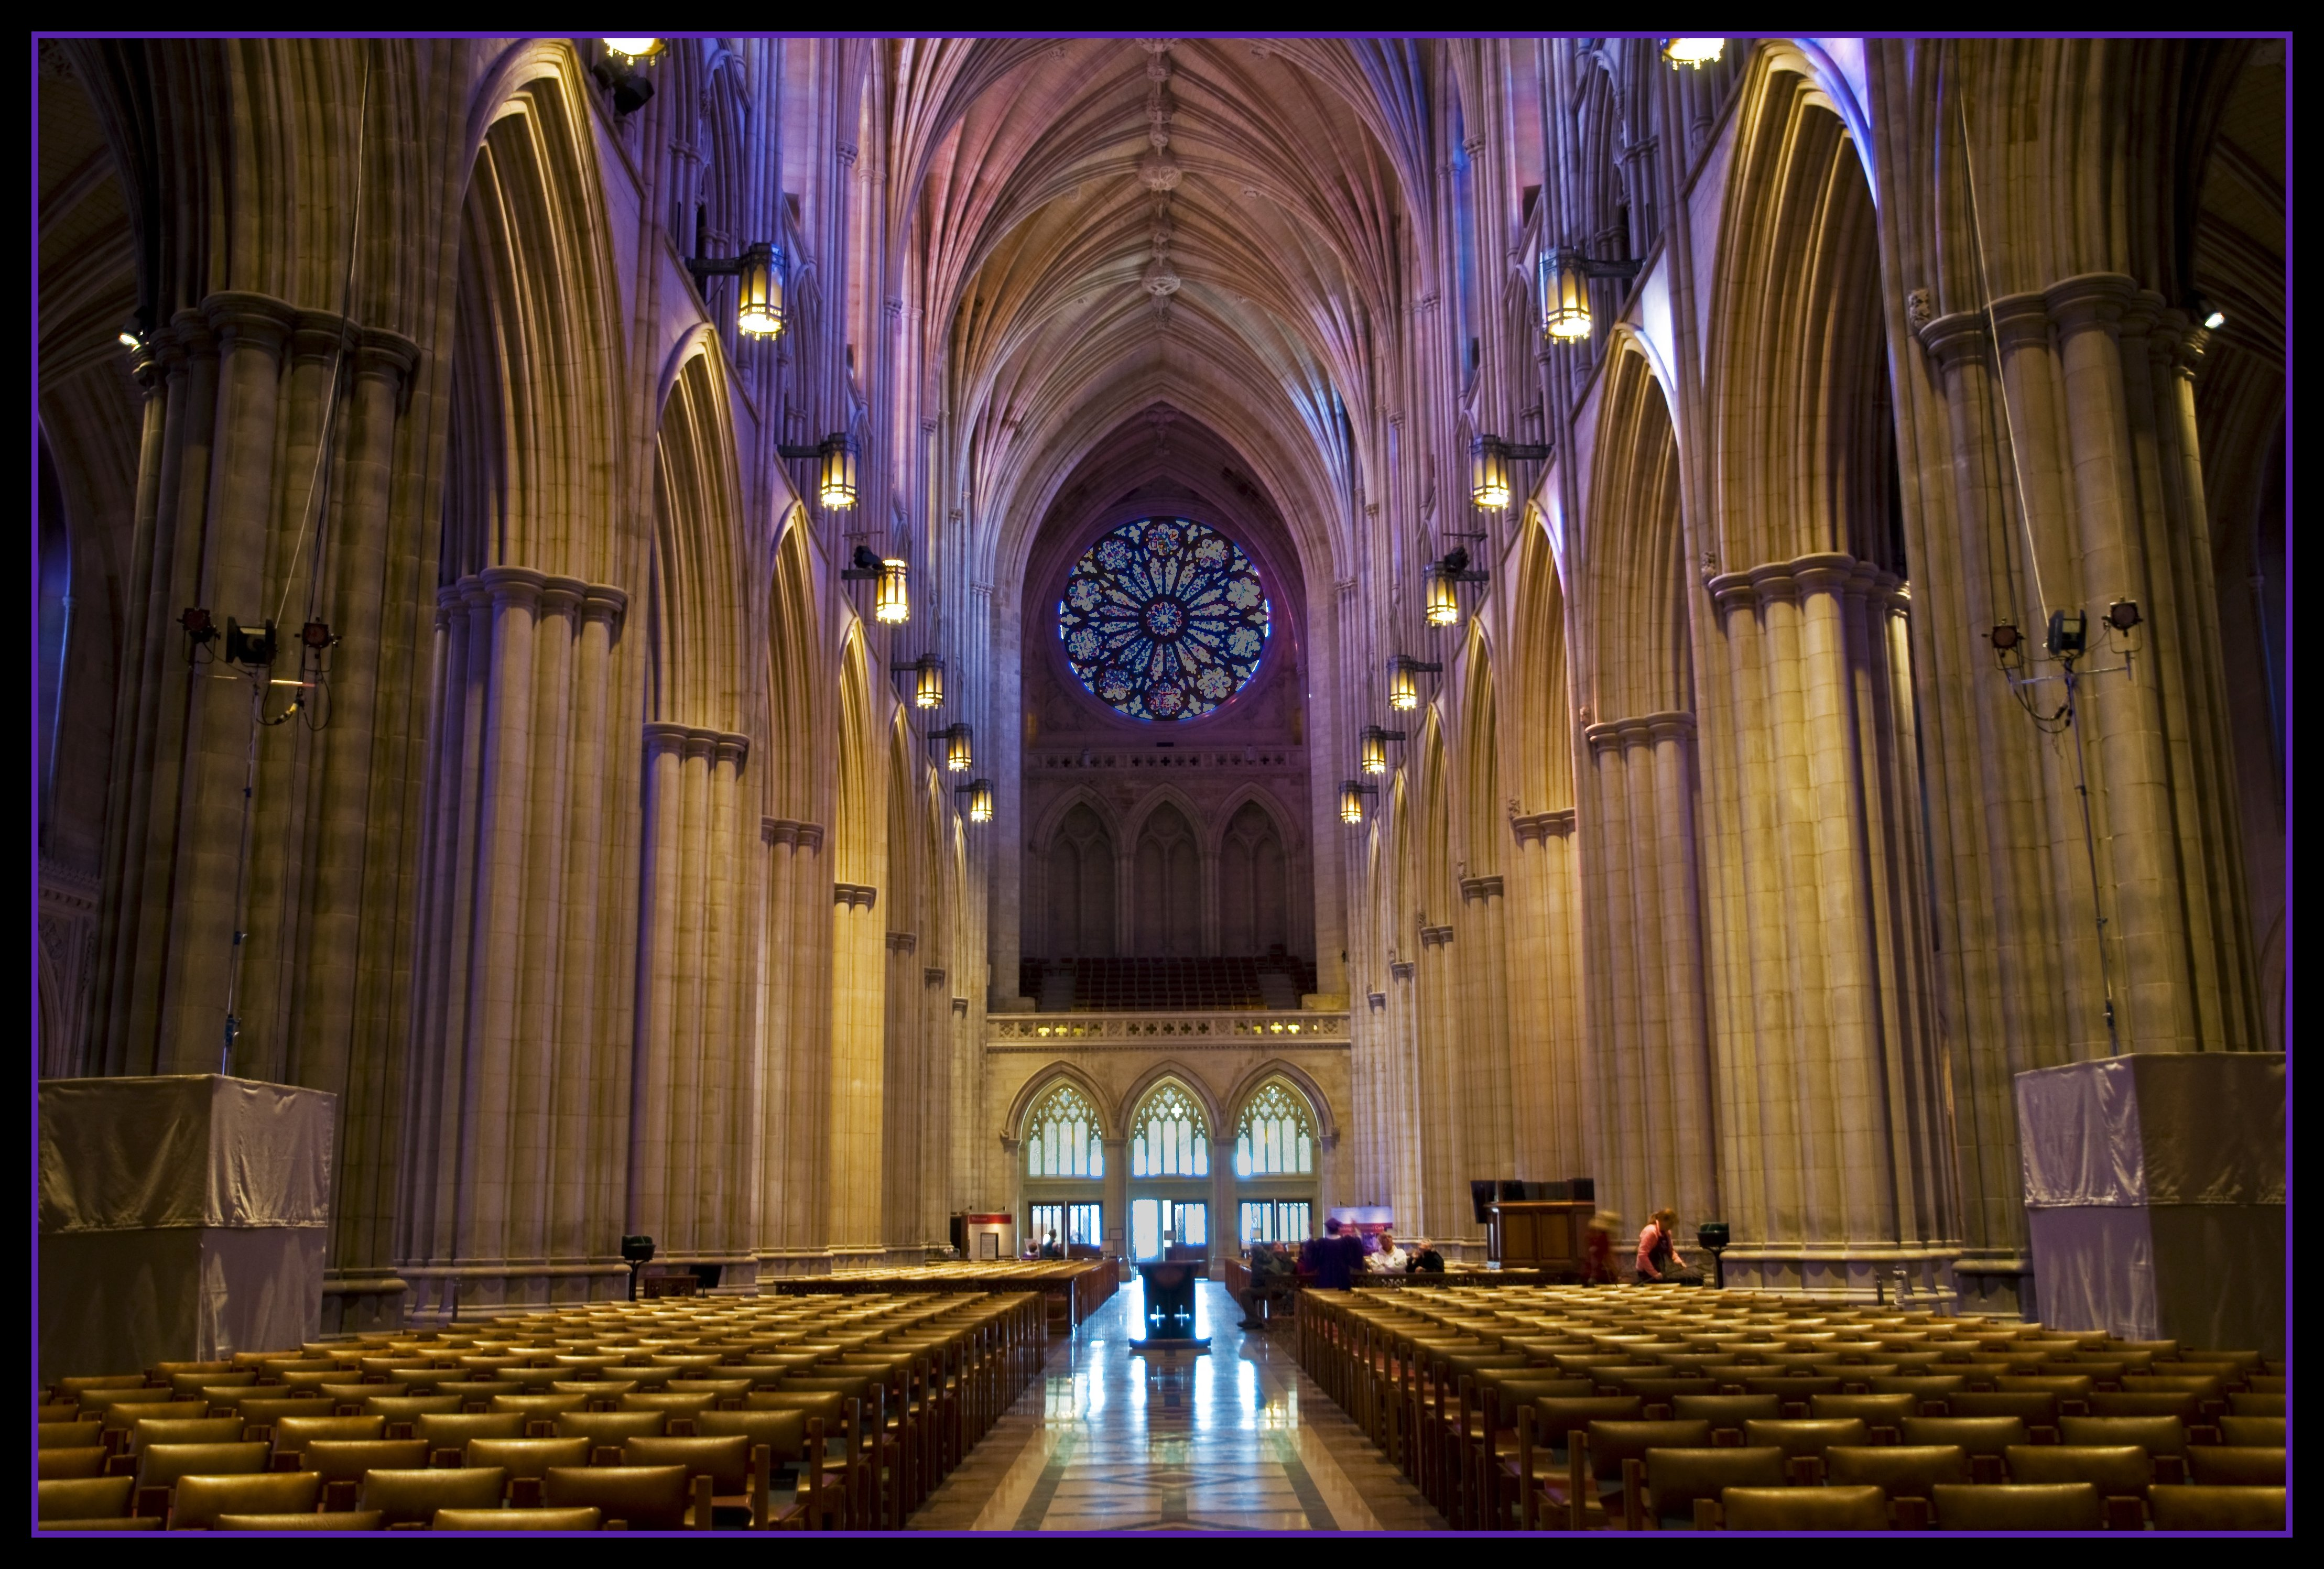 Magical Lighting Washington National Cathedral Washington